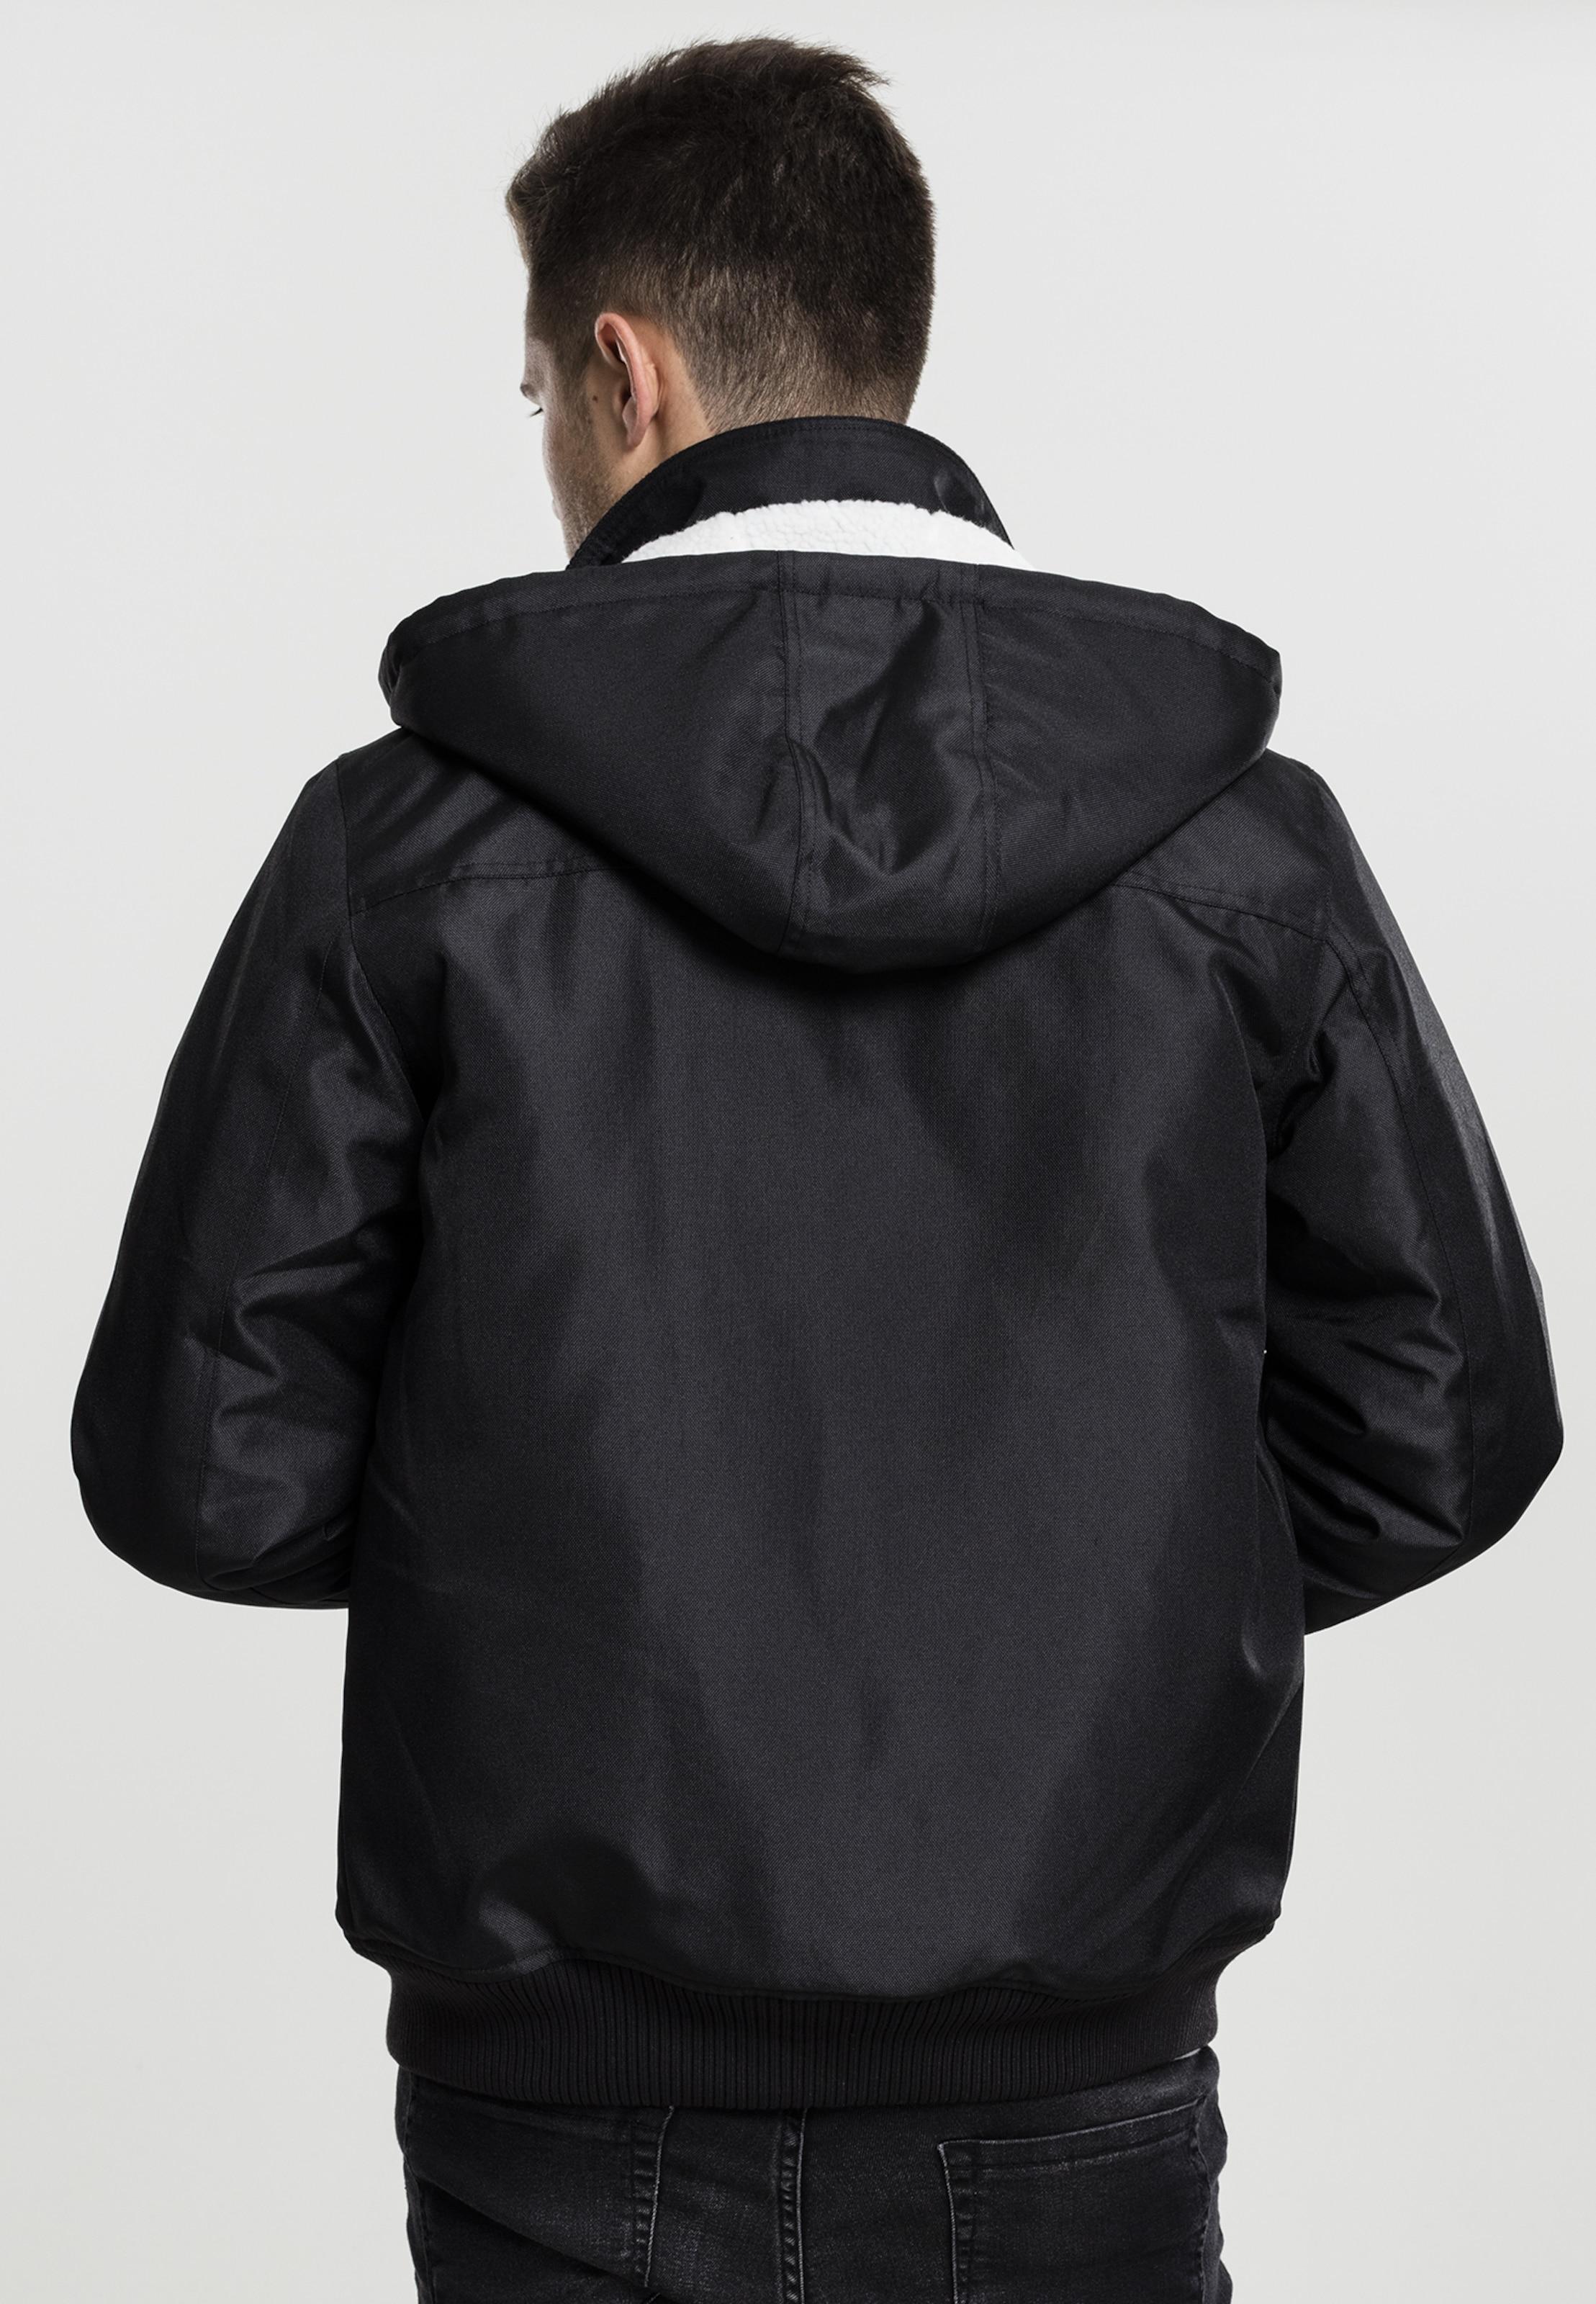 Jacket Classics Urban In Schwarz In Urban Jacket Classics wXuOTPlkZi